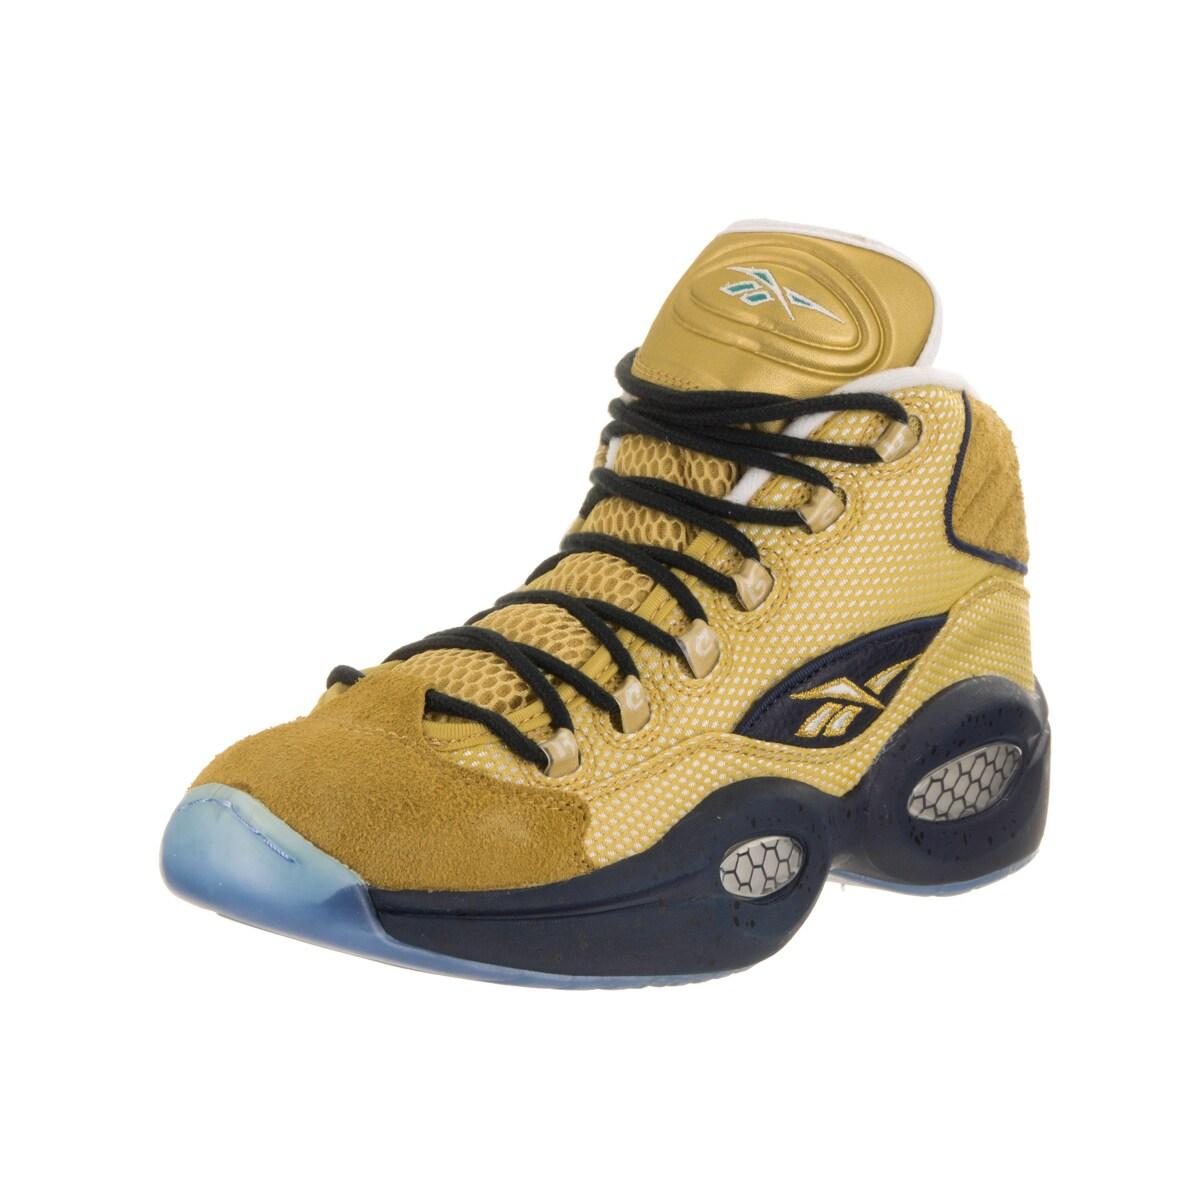 Reebok Men's Question Mid EBC Basketball Shoe (11), Yello...